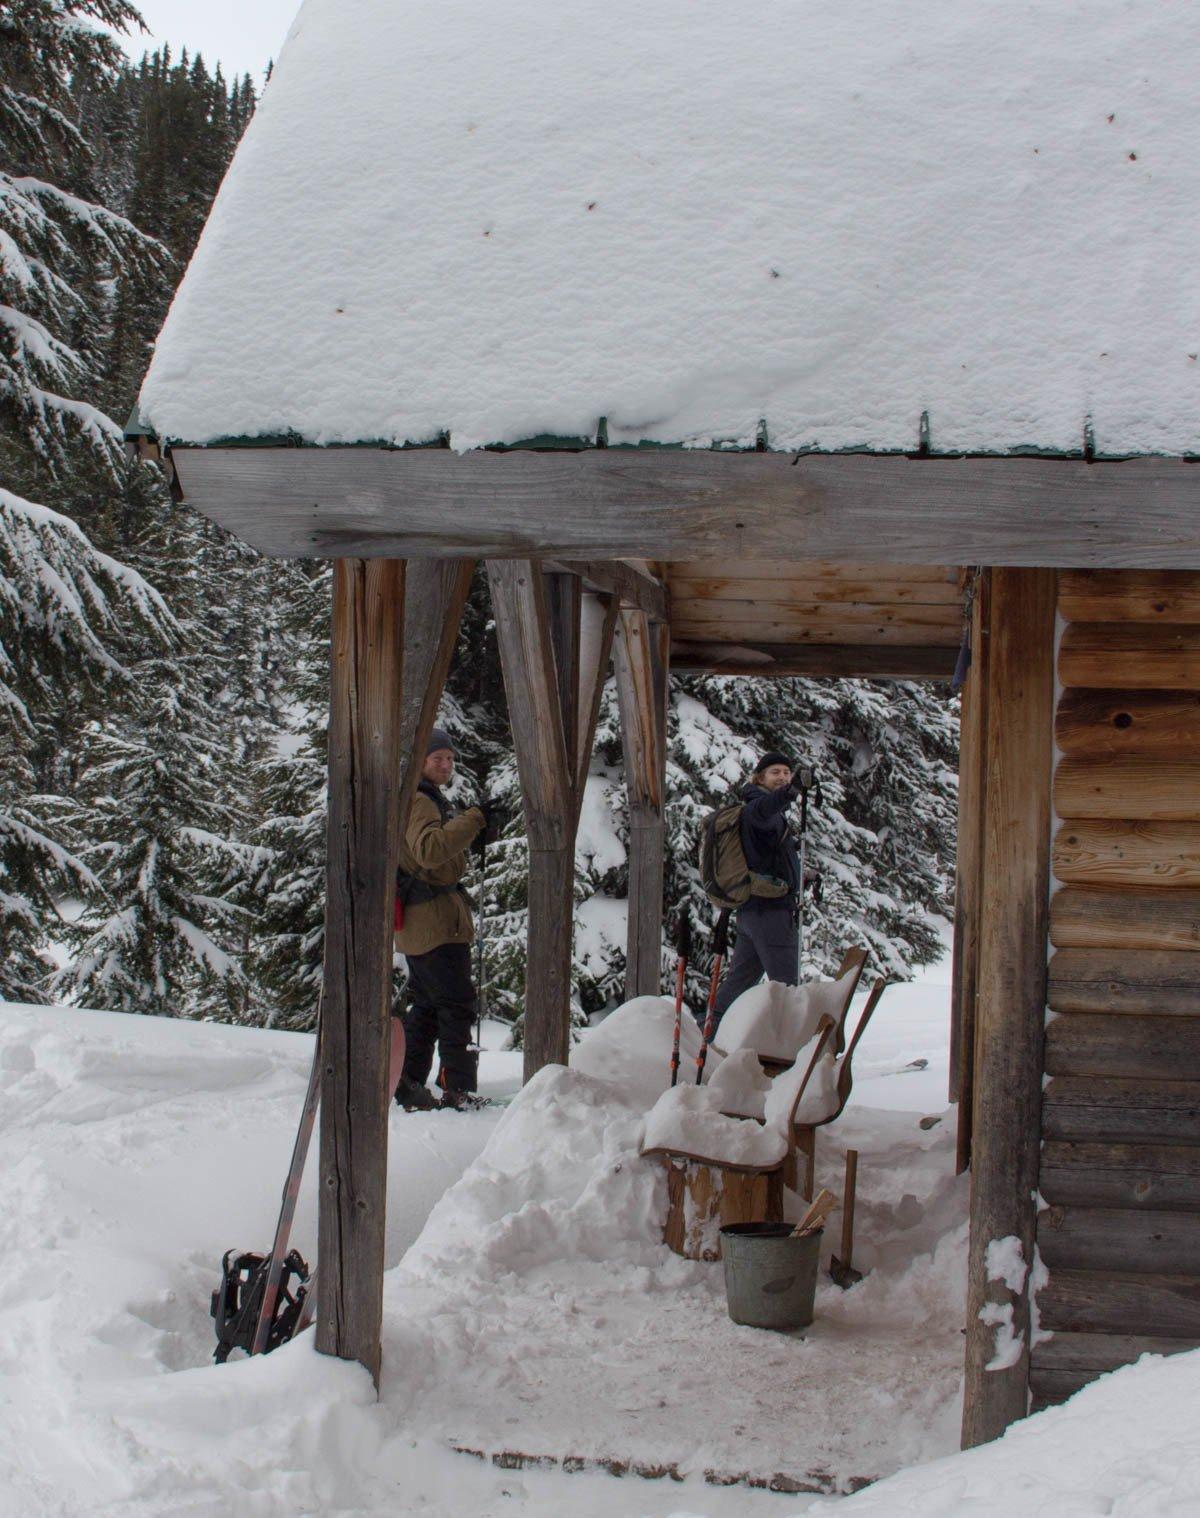 Keith's hut trip